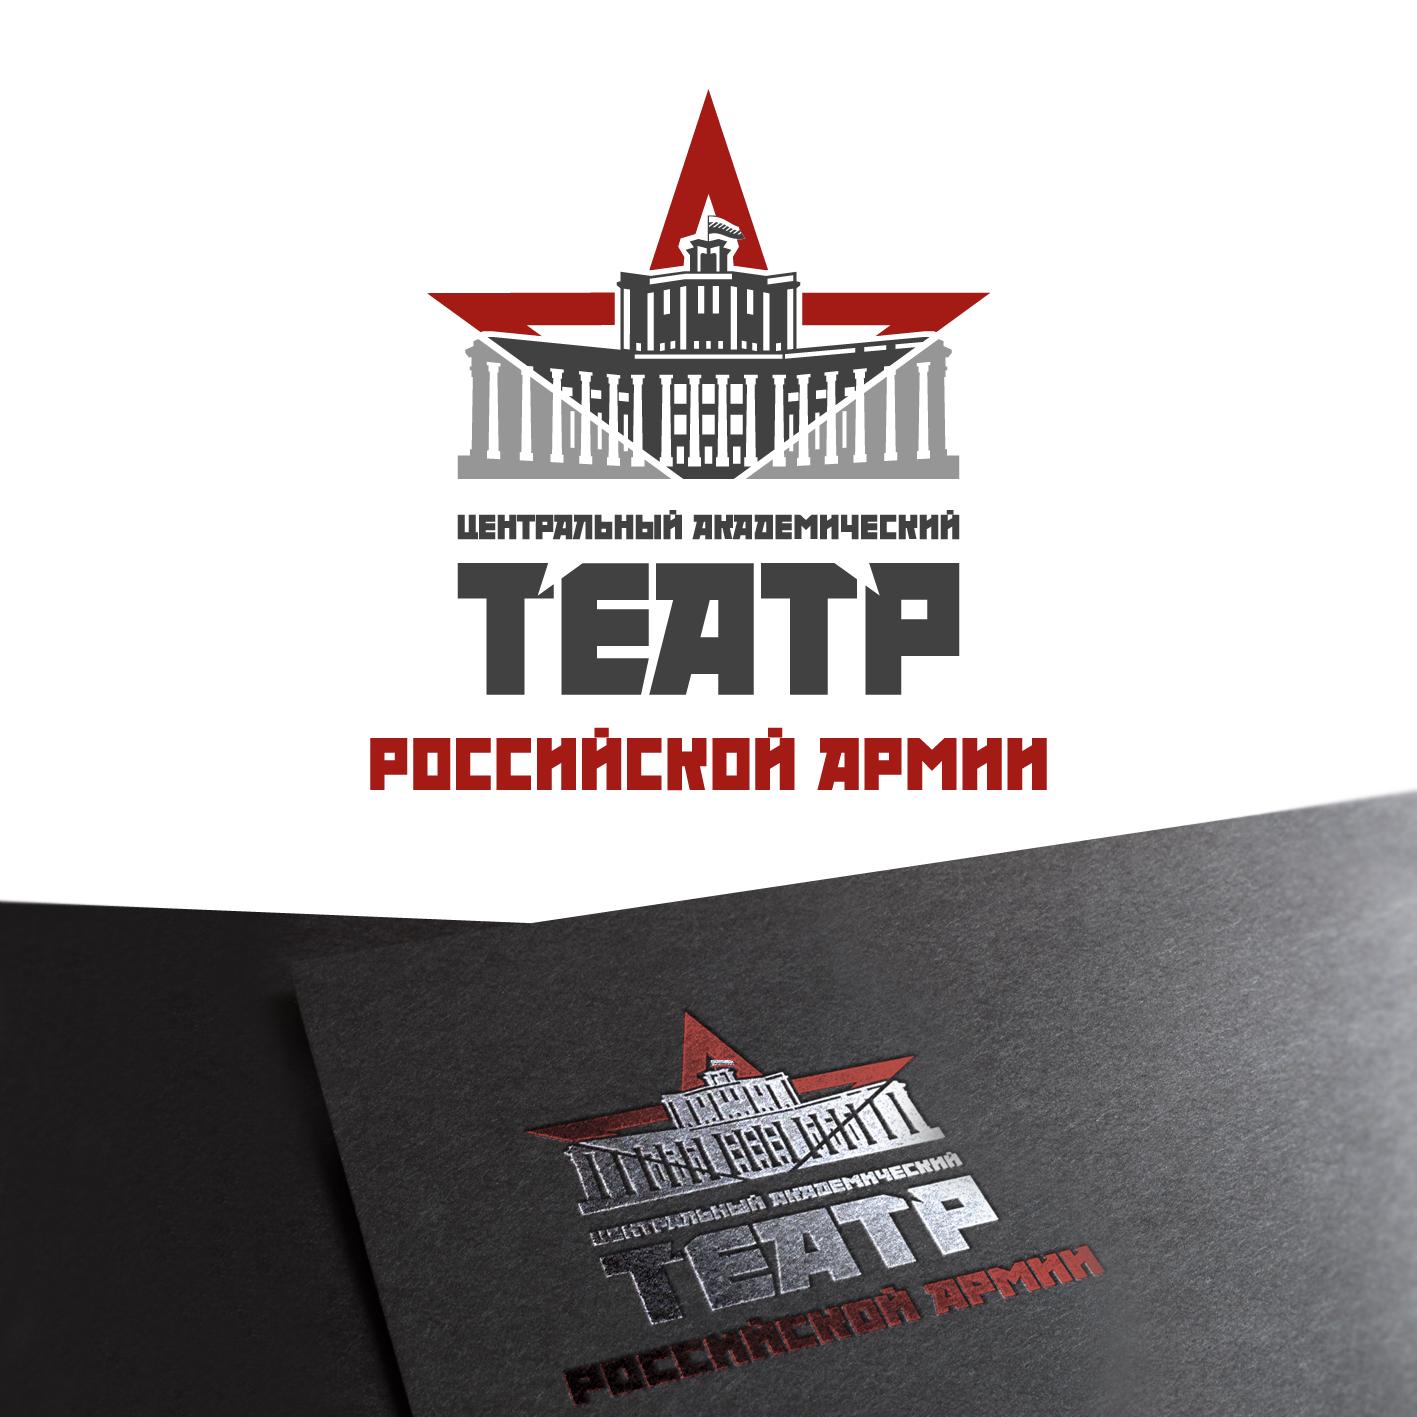 Разработка логотипа для Театра Российской Армии фото f_70158874ac6e4b0e.png